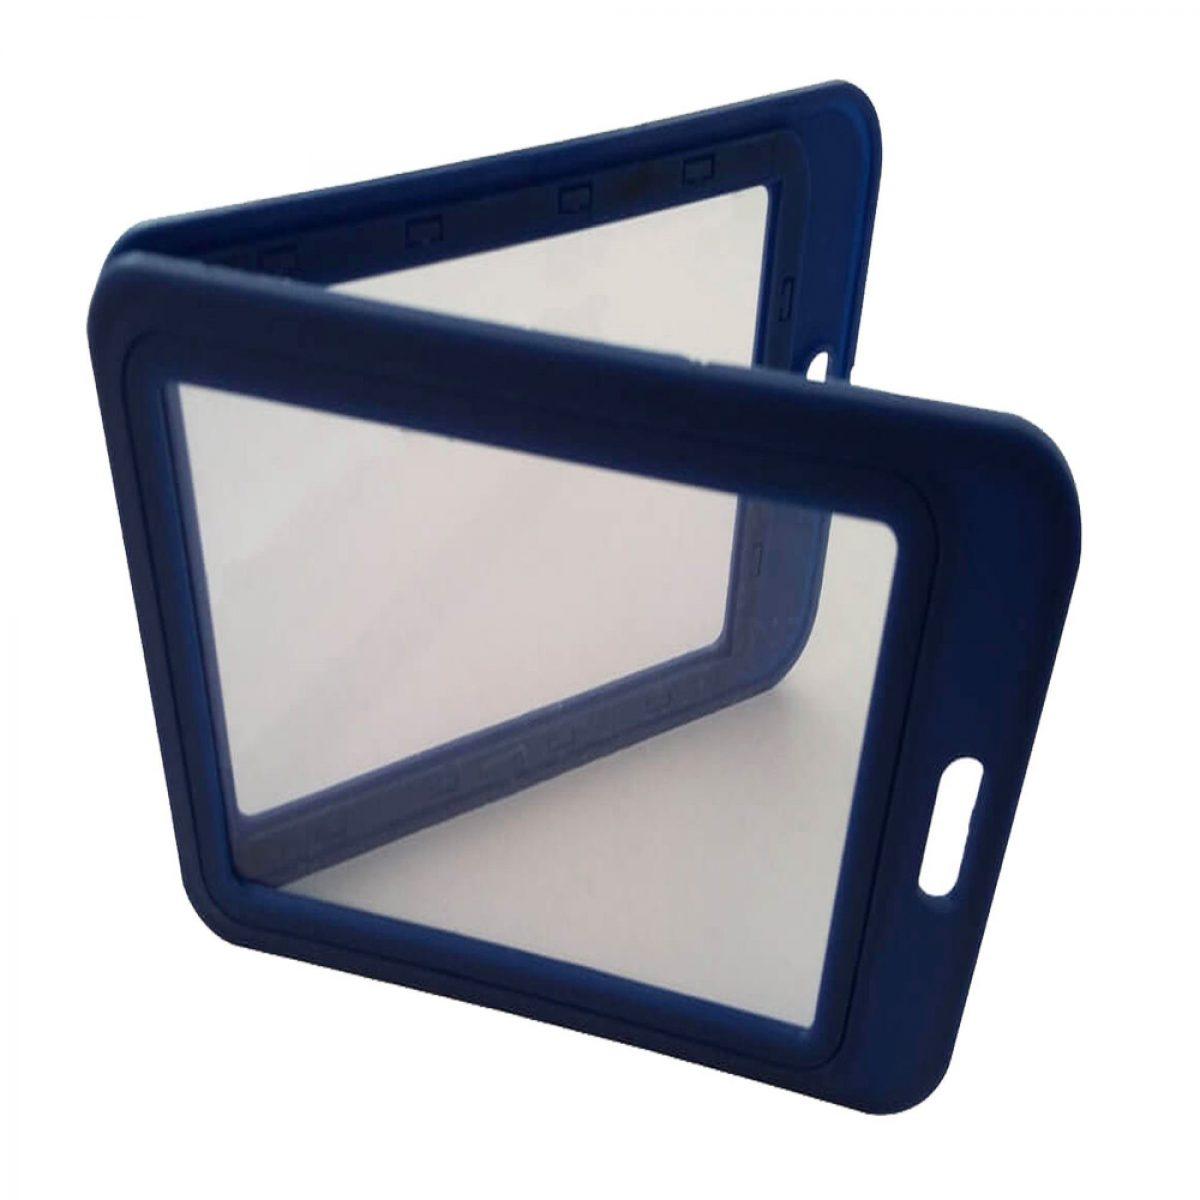 Suport carduri orizontal, 85x54 mm KEJEA T-001H, 5 buc/set